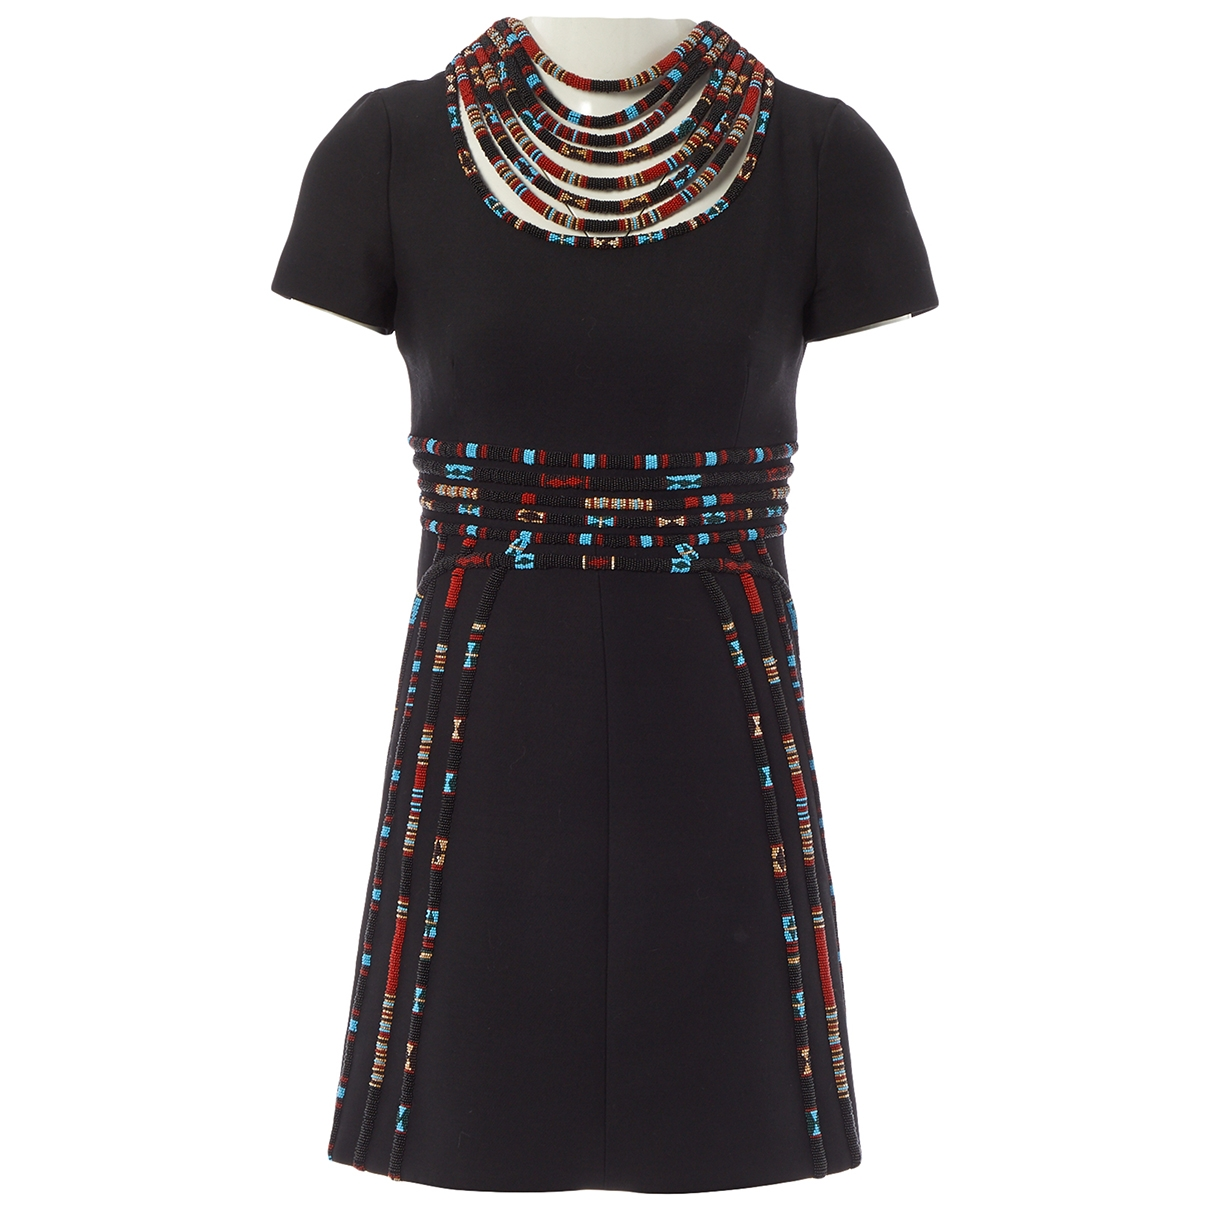 Valentino Garavani \N Black dress for Women 38 IT